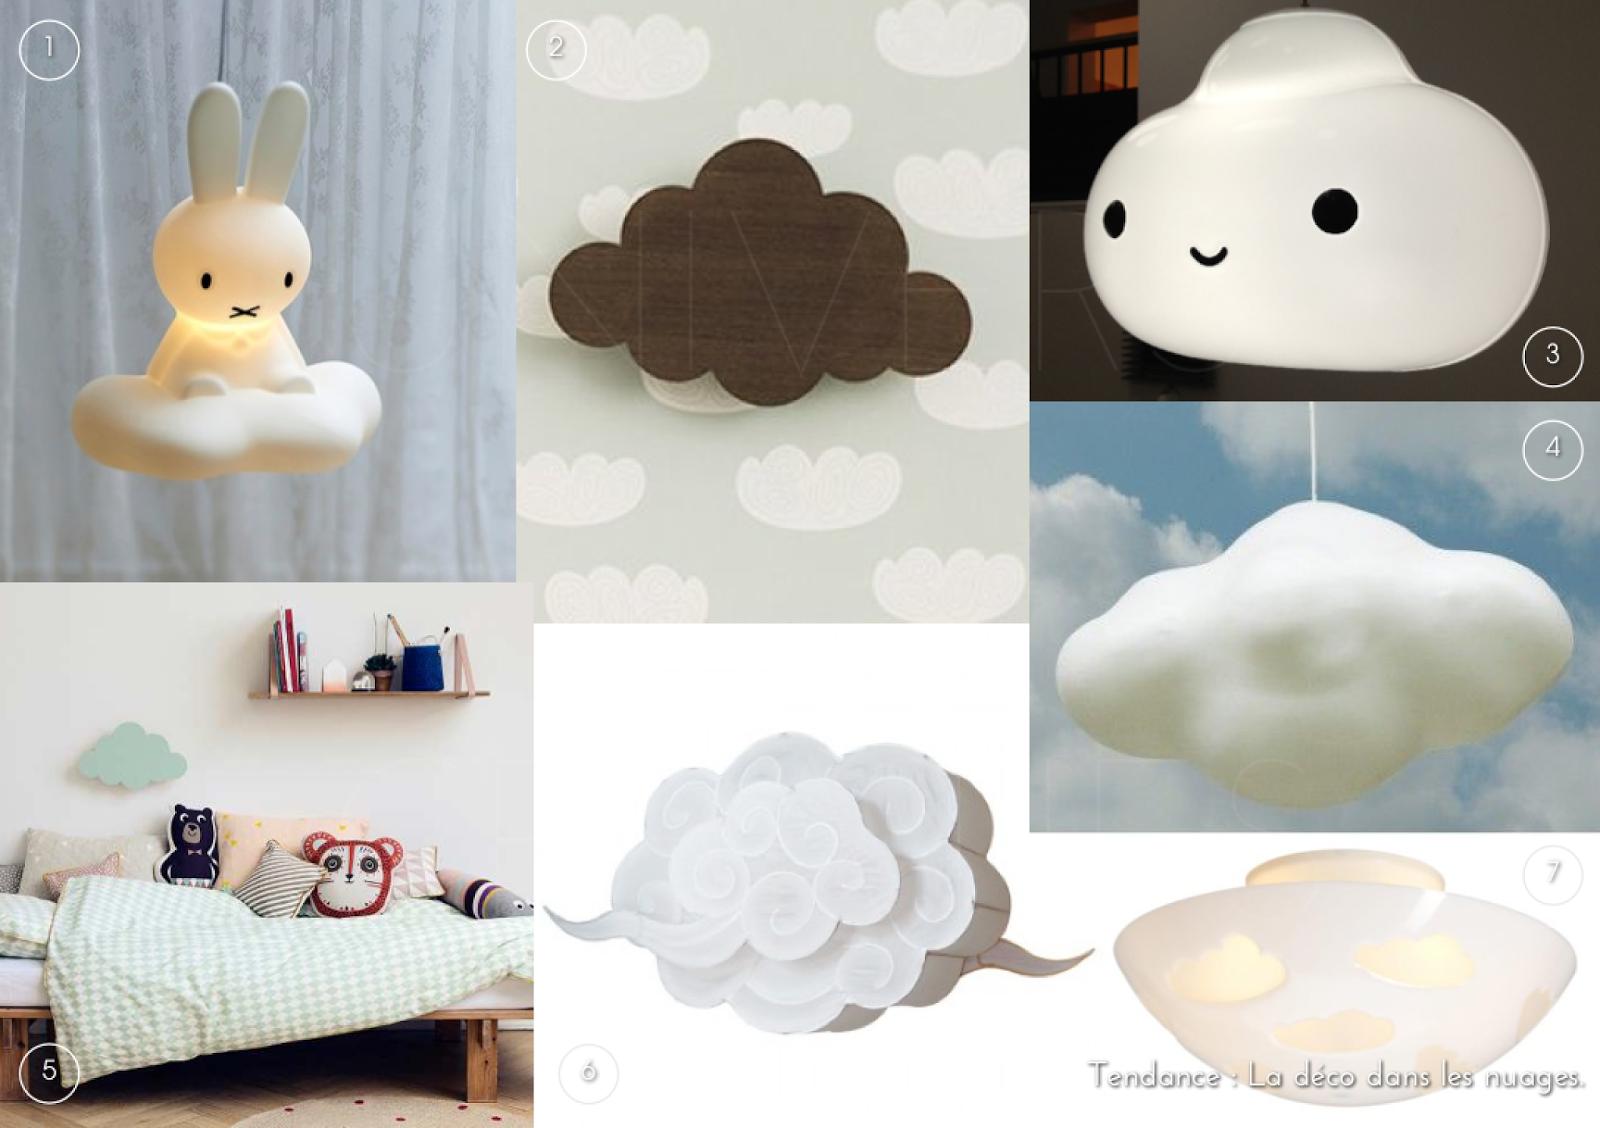 plafonnier nuage. Black Bedroom Furniture Sets. Home Design Ideas